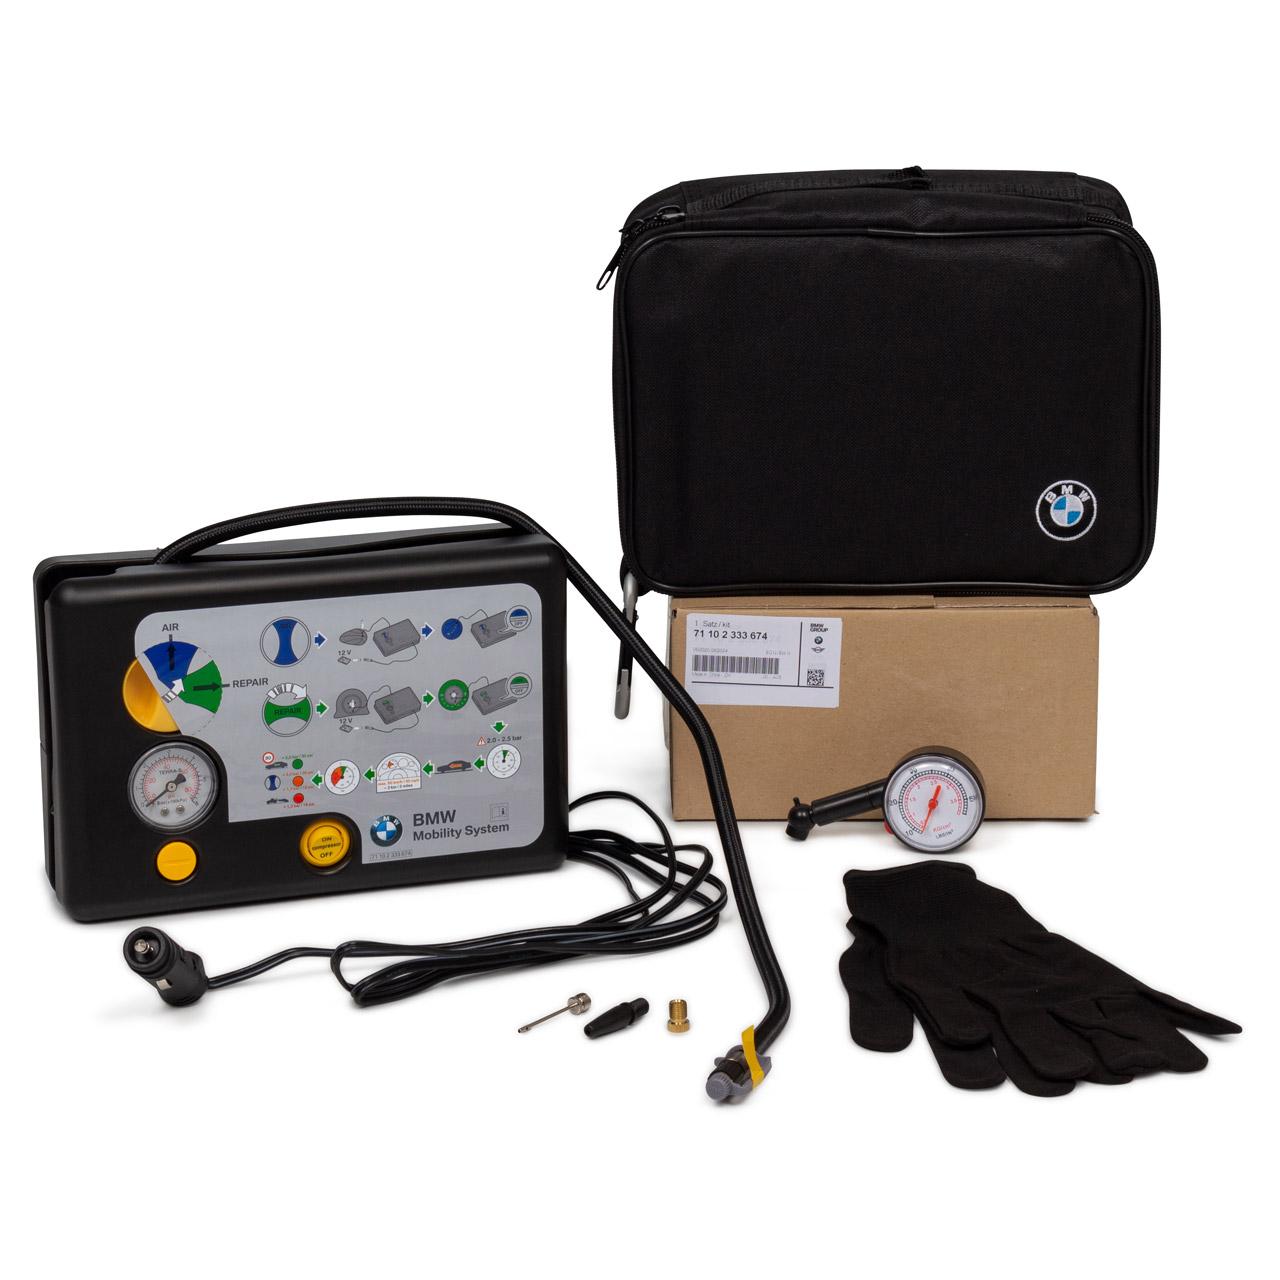 ORIGINAL BMW Reifen-Mobility-Set Reifen Pannenset Kompressor 71102333674